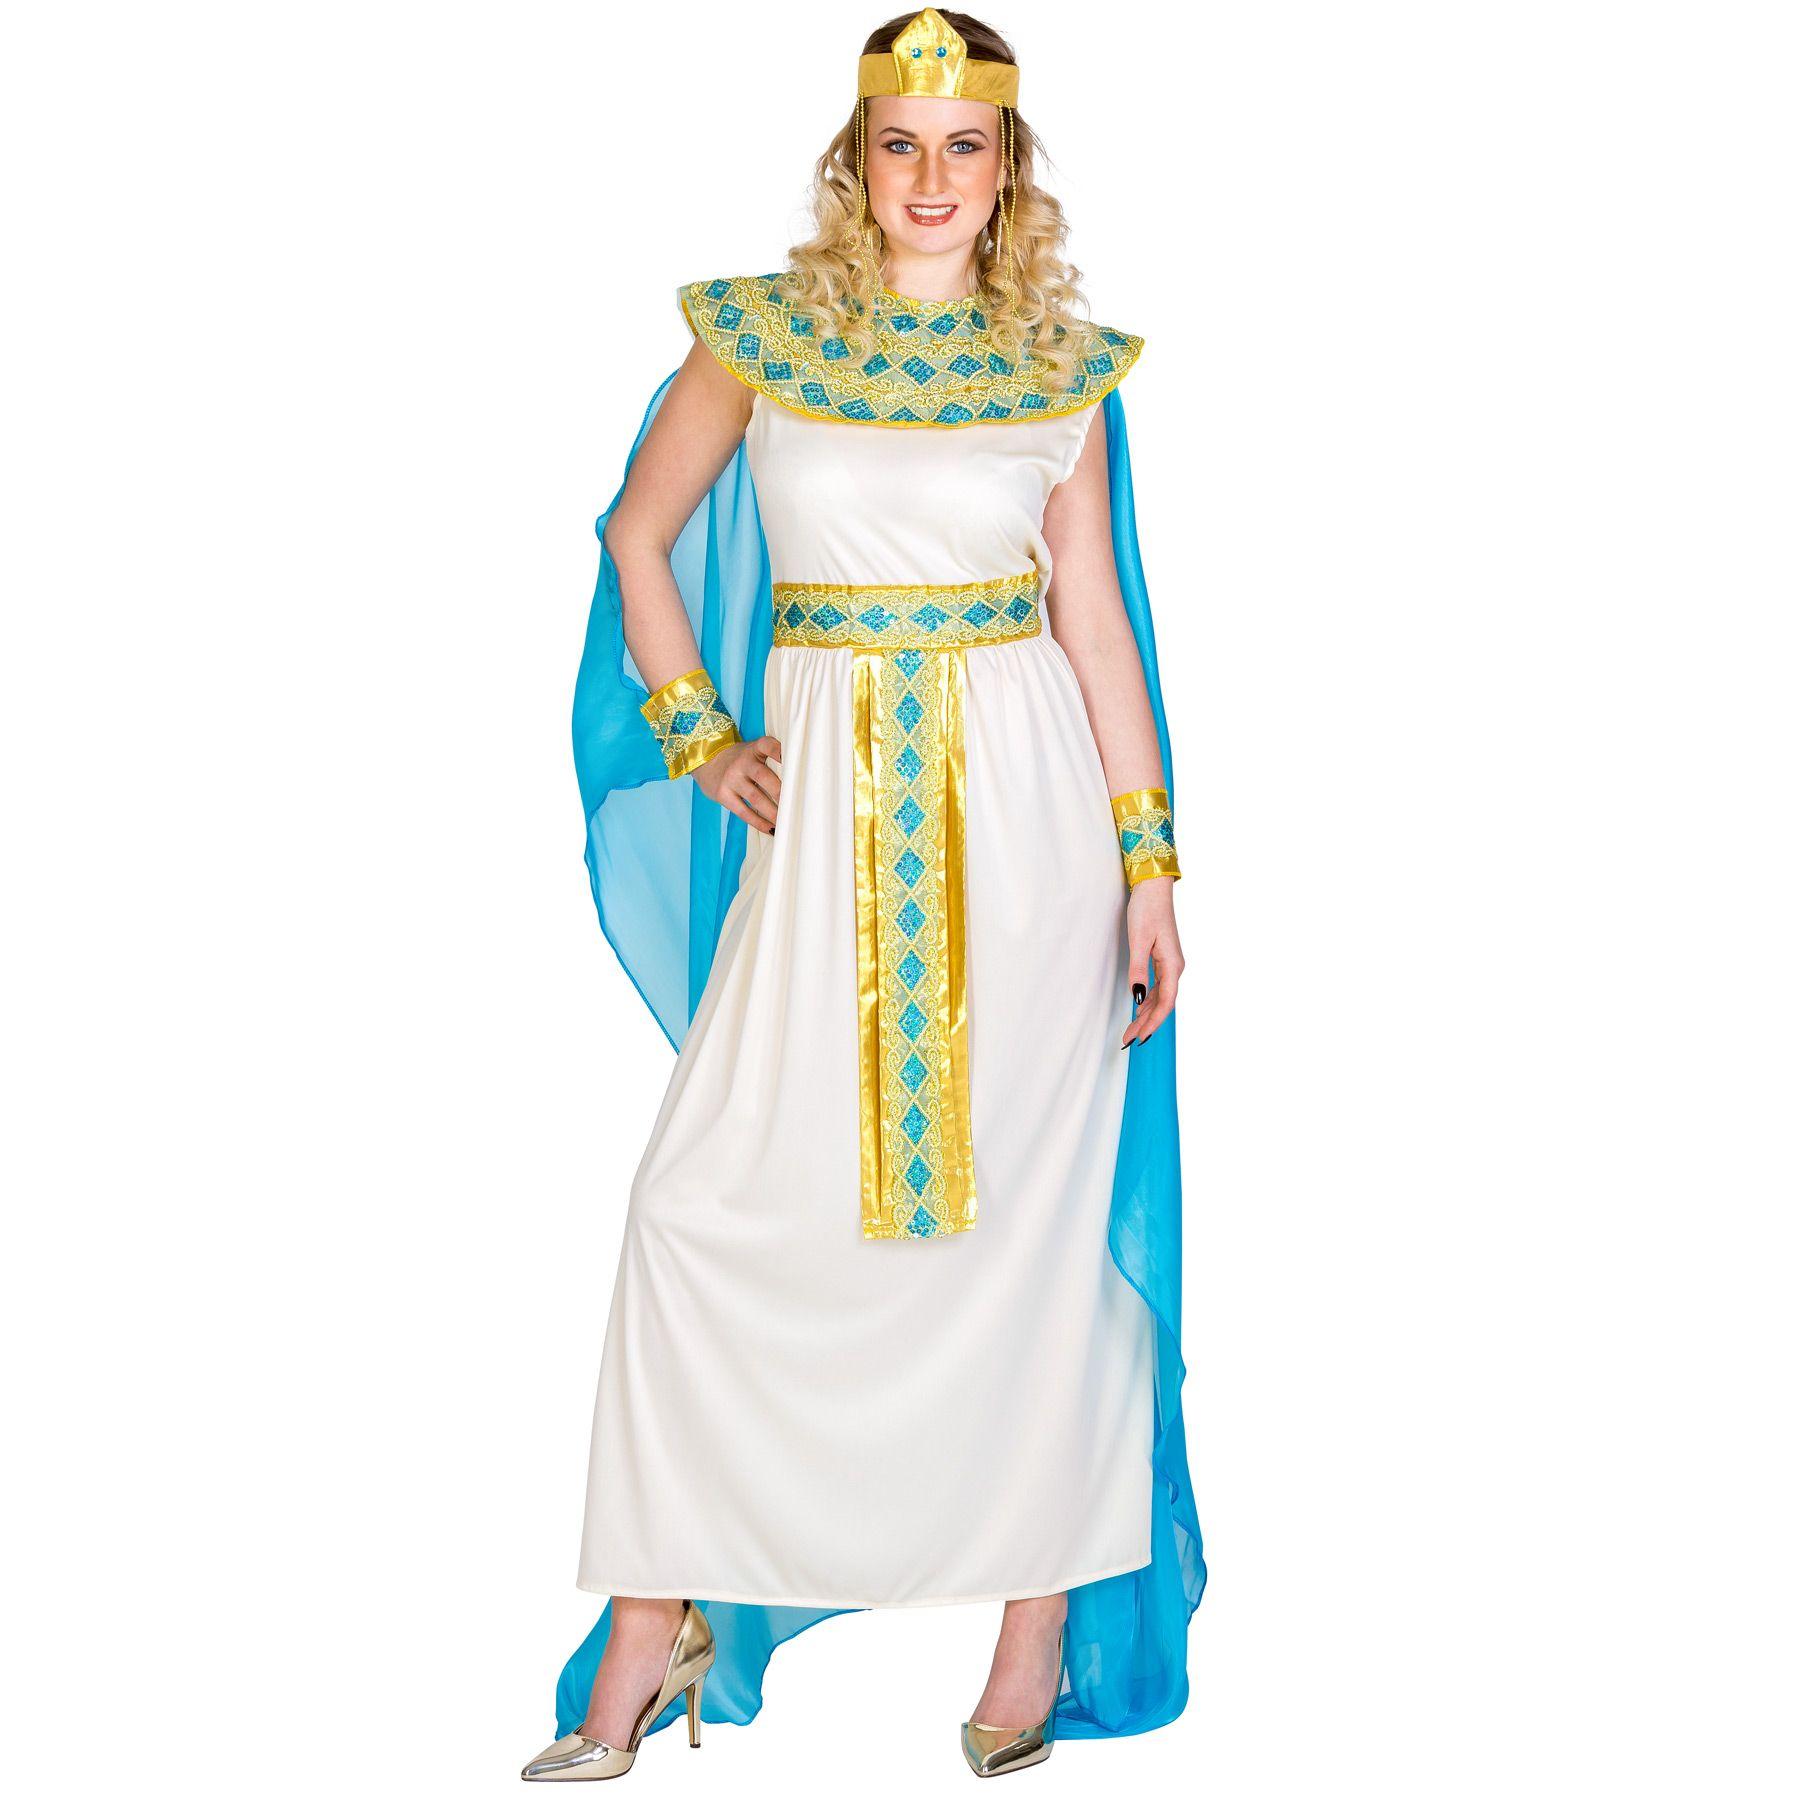 kleopatra kost m karneval fasching fastnacht damen faschingskost m gypterin ebay. Black Bedroom Furniture Sets. Home Design Ideas